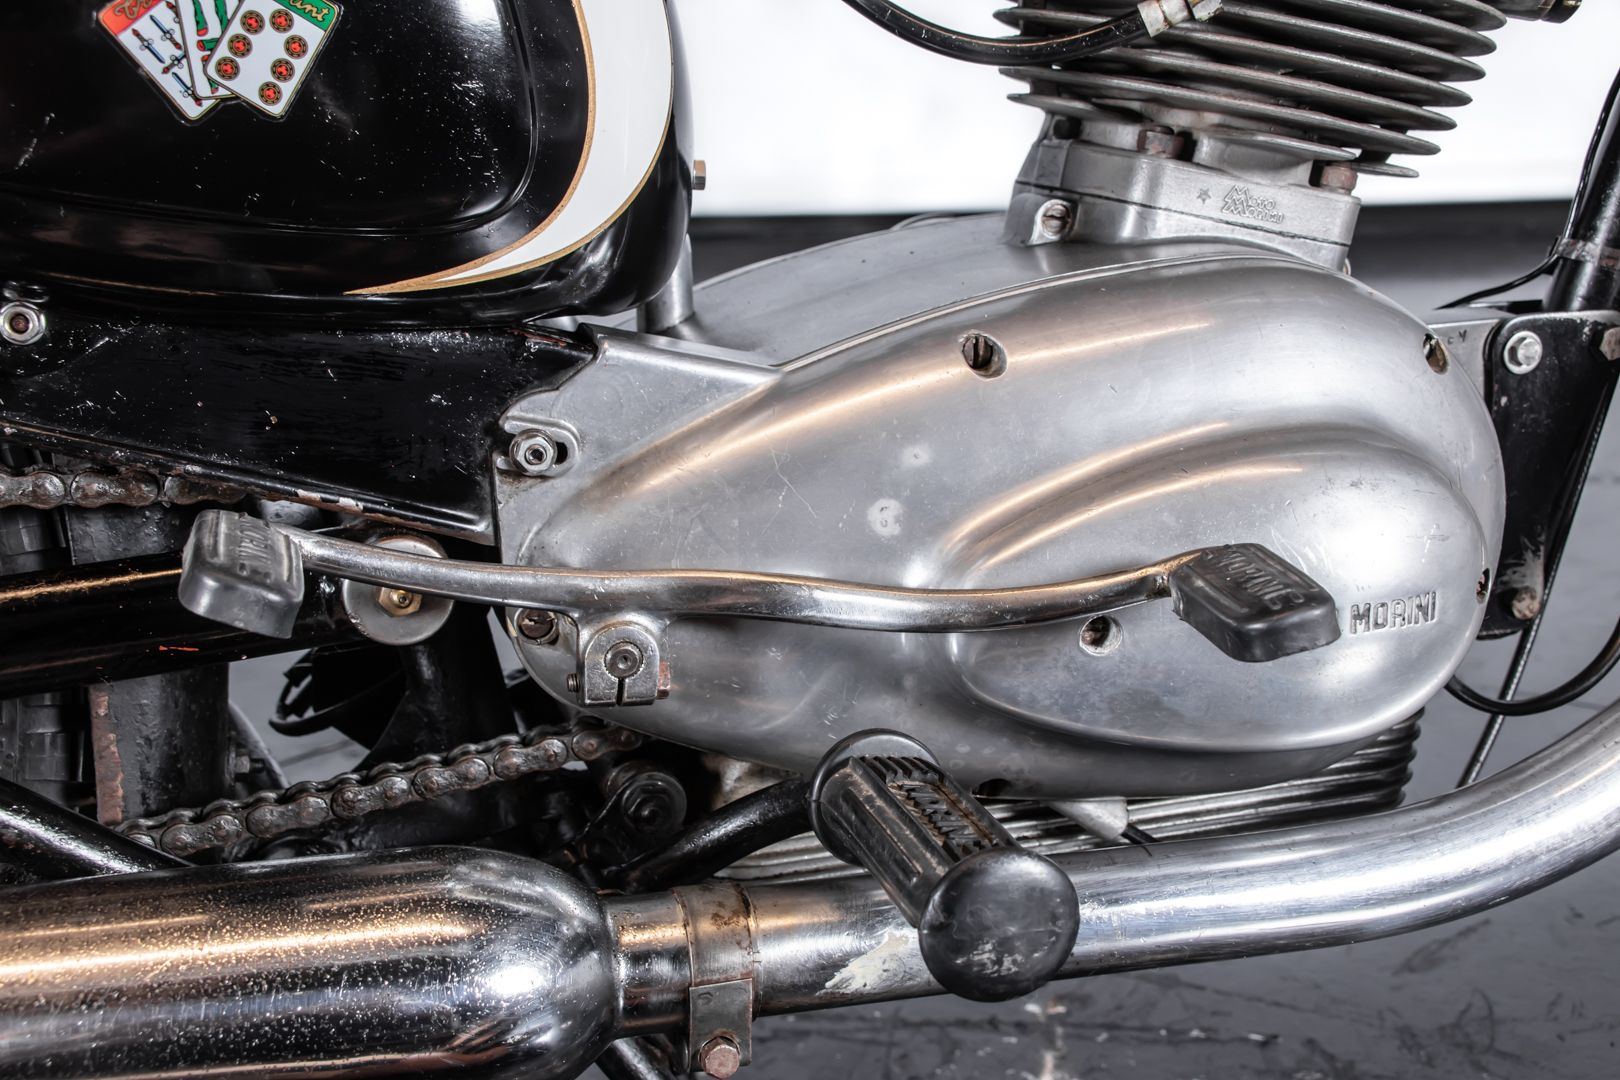 1960 Moto Morini Tresette Sprint 175 76492